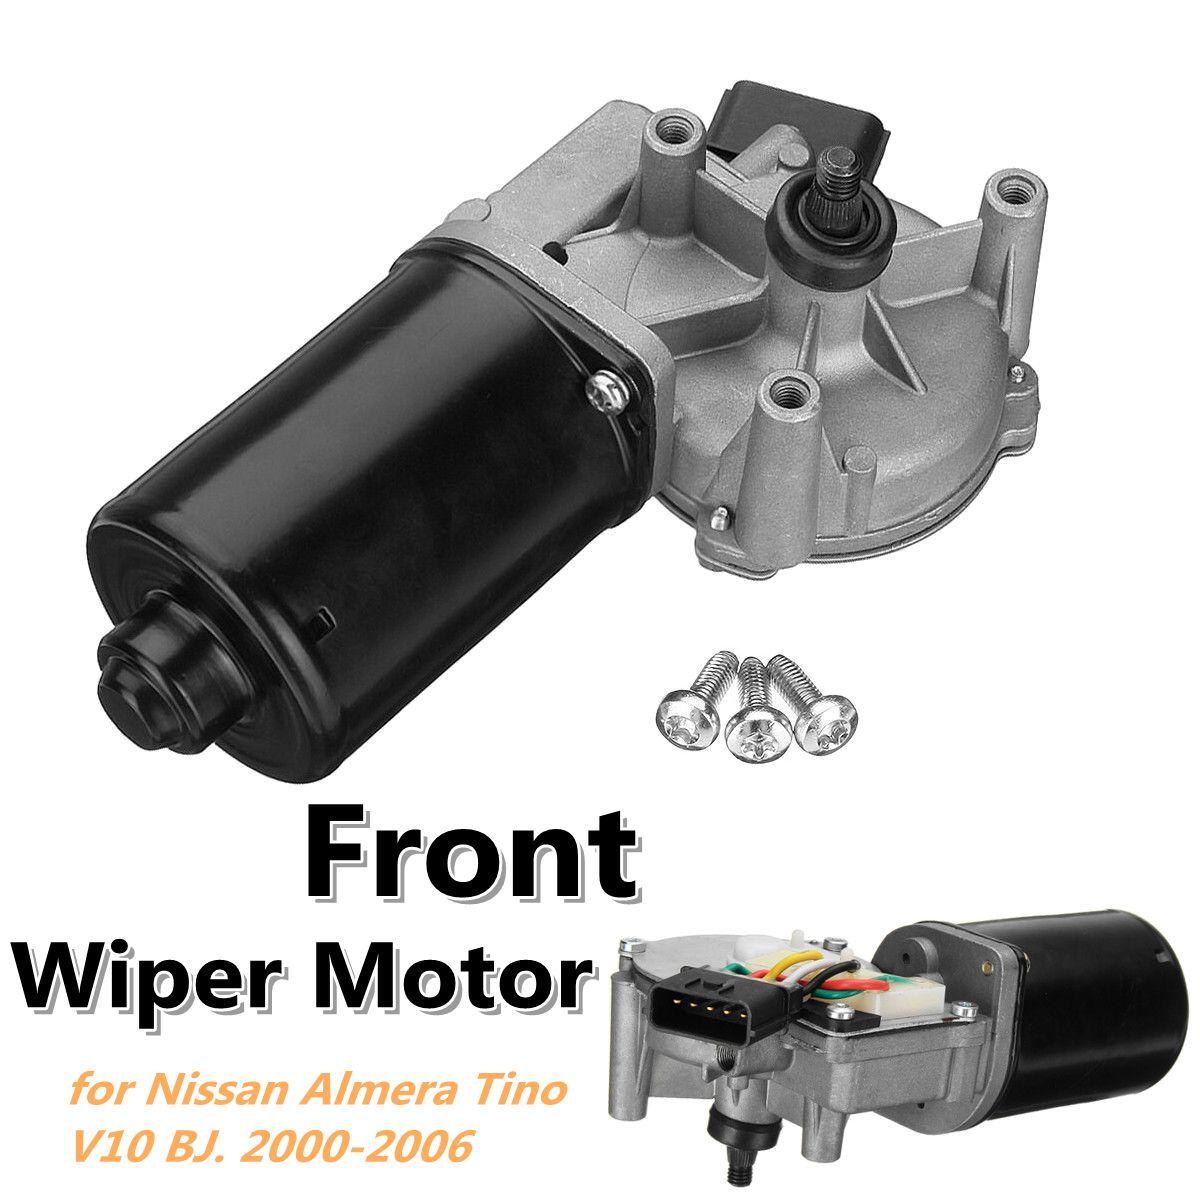 Car Front Windscreen Wiper Motor 28815-BU000 0390241373 for Nissan Almera Tino V10 1998-2006 MPV комплект адаптеров nissan almera classic 2006 2013 almera tino 2002